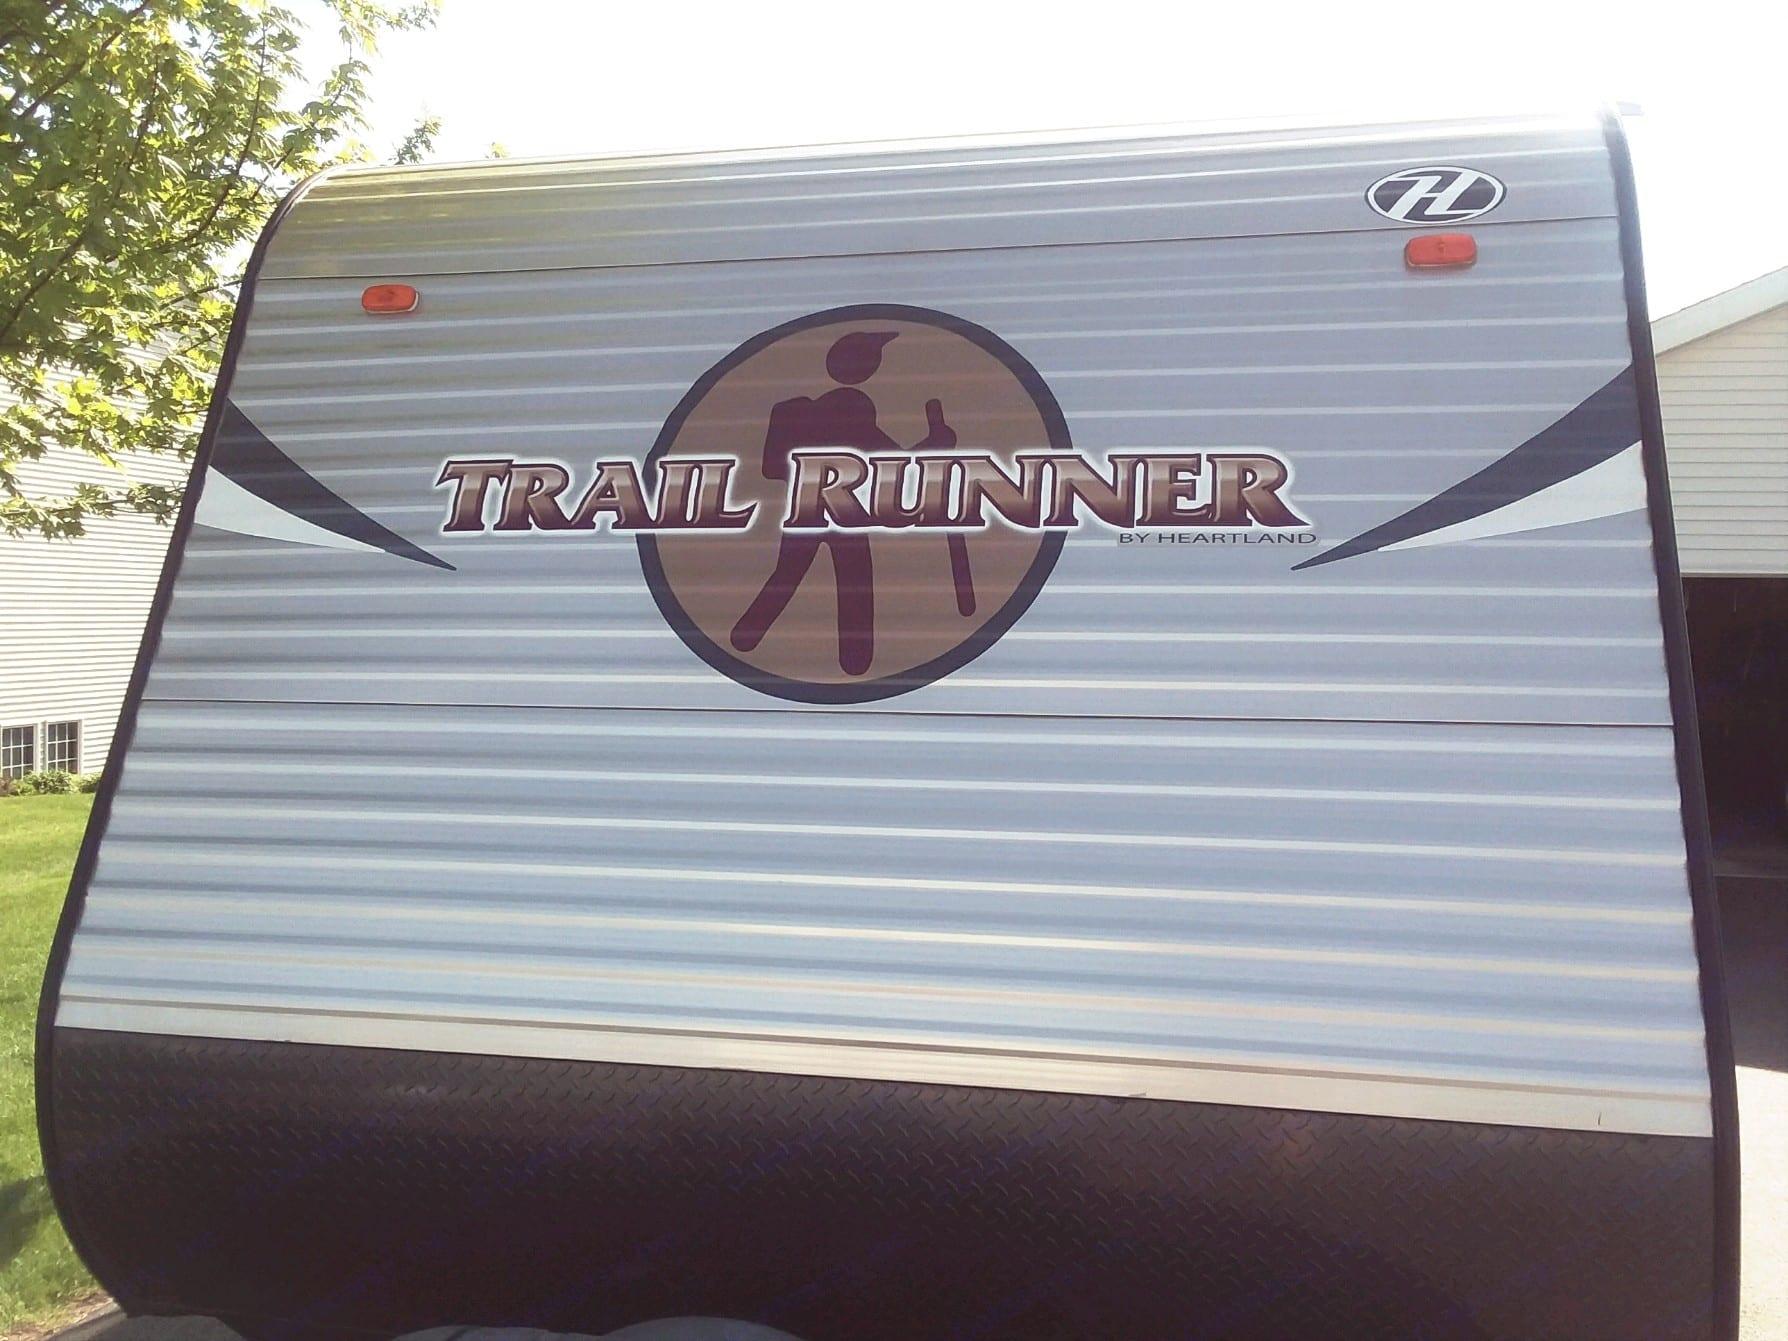 Heartland Trail Runner 2014